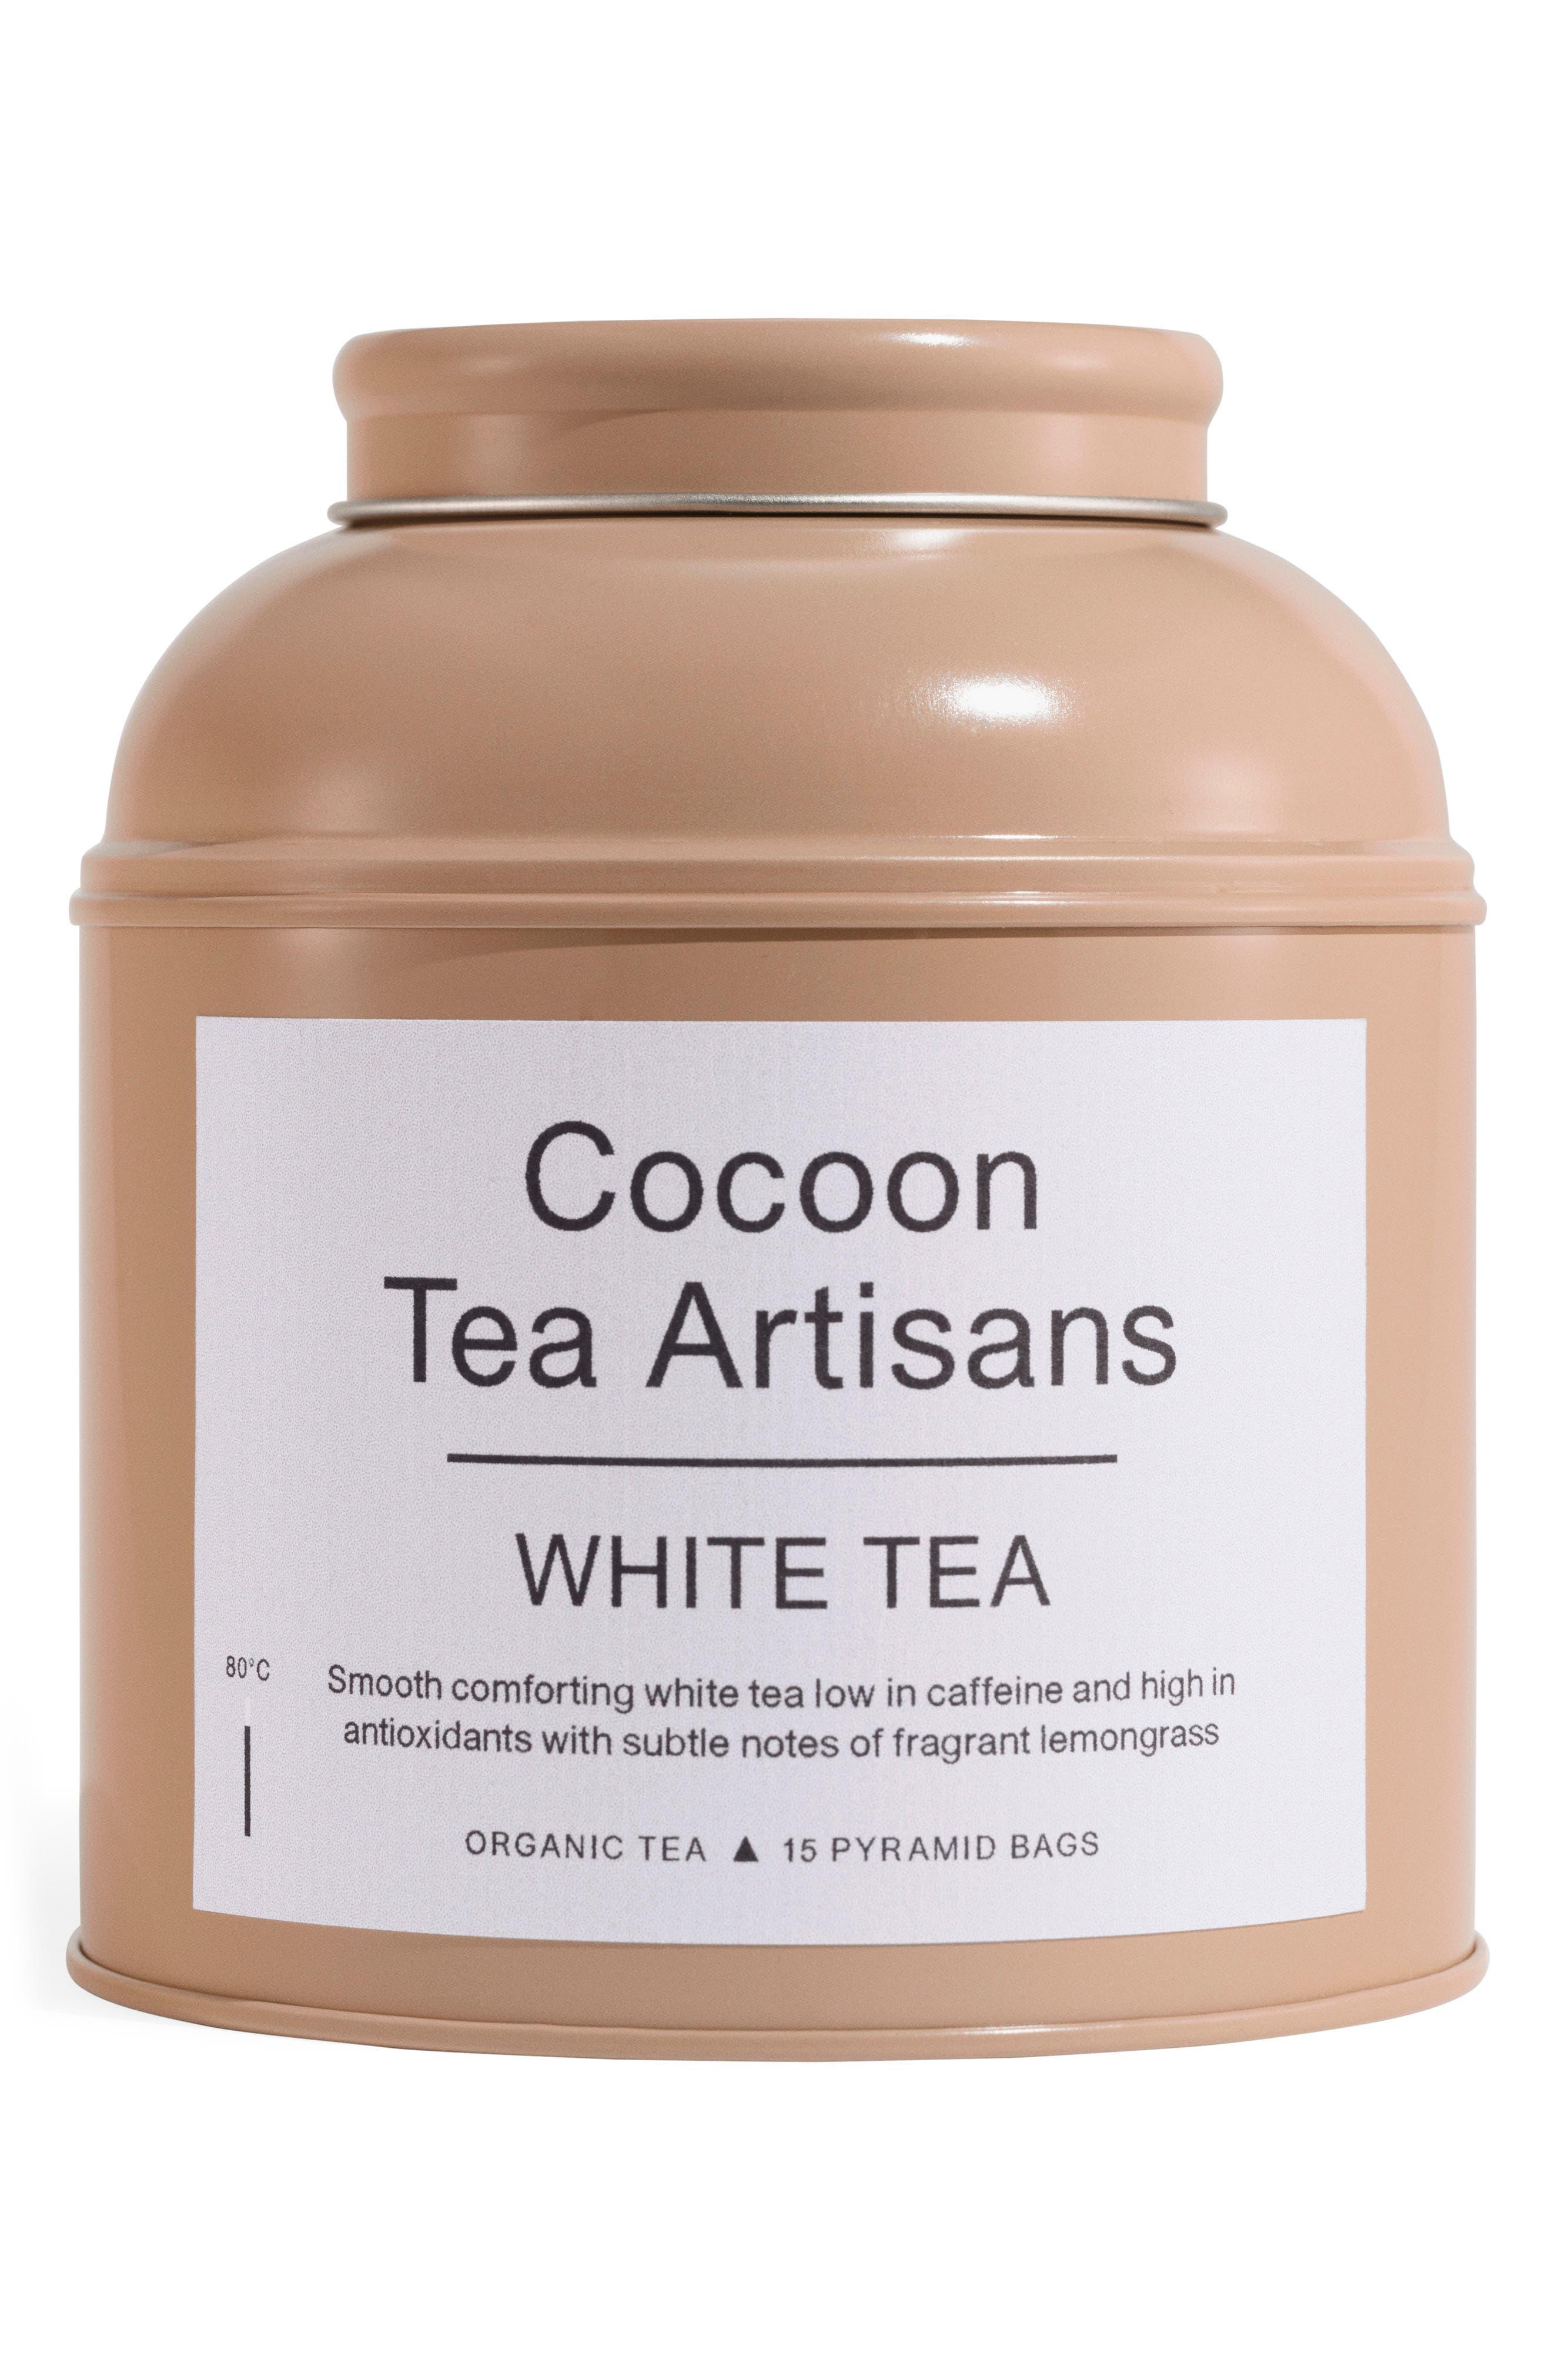 Cocoon Tea Artisans White Tea Big Tea Caddy